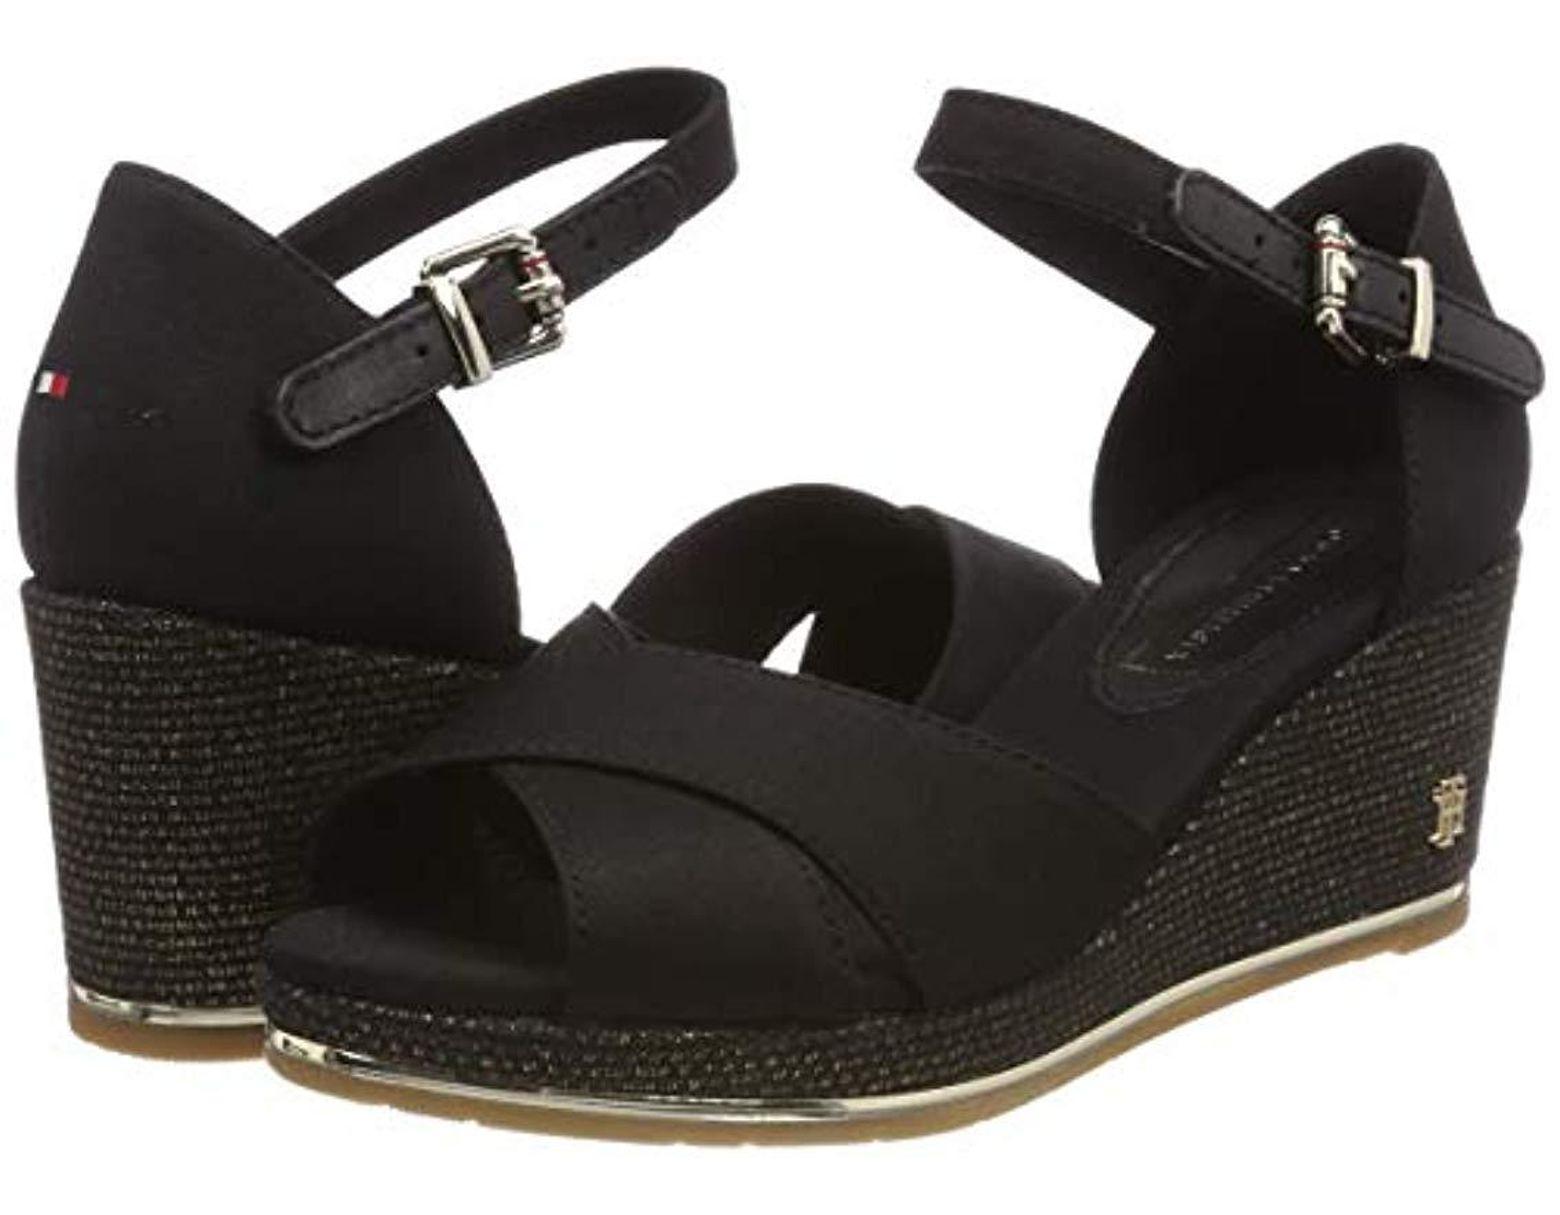 a1e57f5e25 Tommy Hilfiger Feminine Mid Wedge Sandal Basic Platform in Black - Save 39%  - Lyst